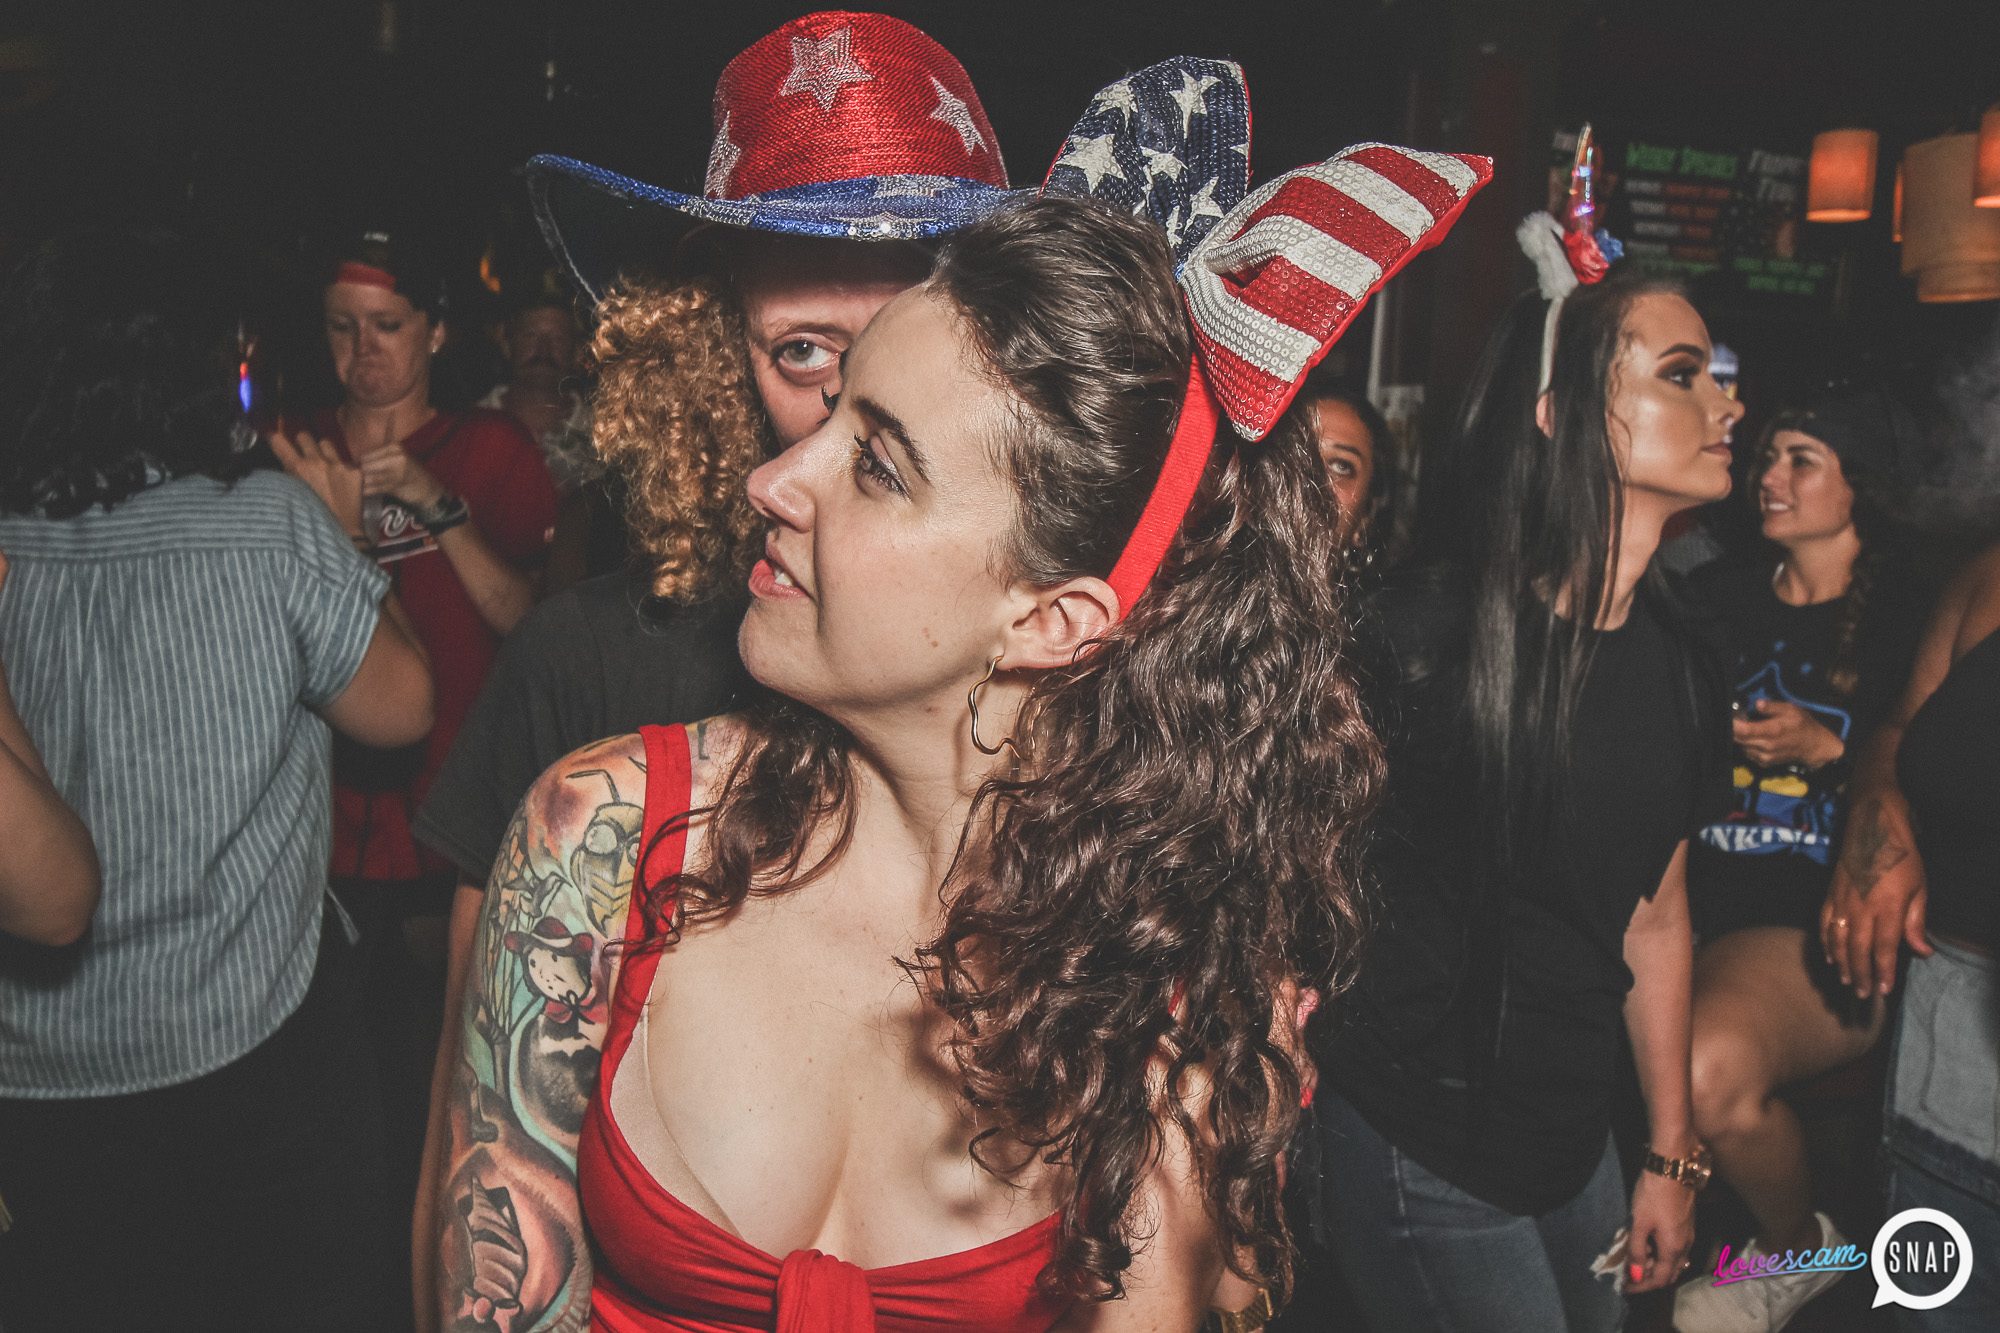 Lovescam 7.6.19 Oh Snap Kid Colin Boddy Atlanta-54.jpg